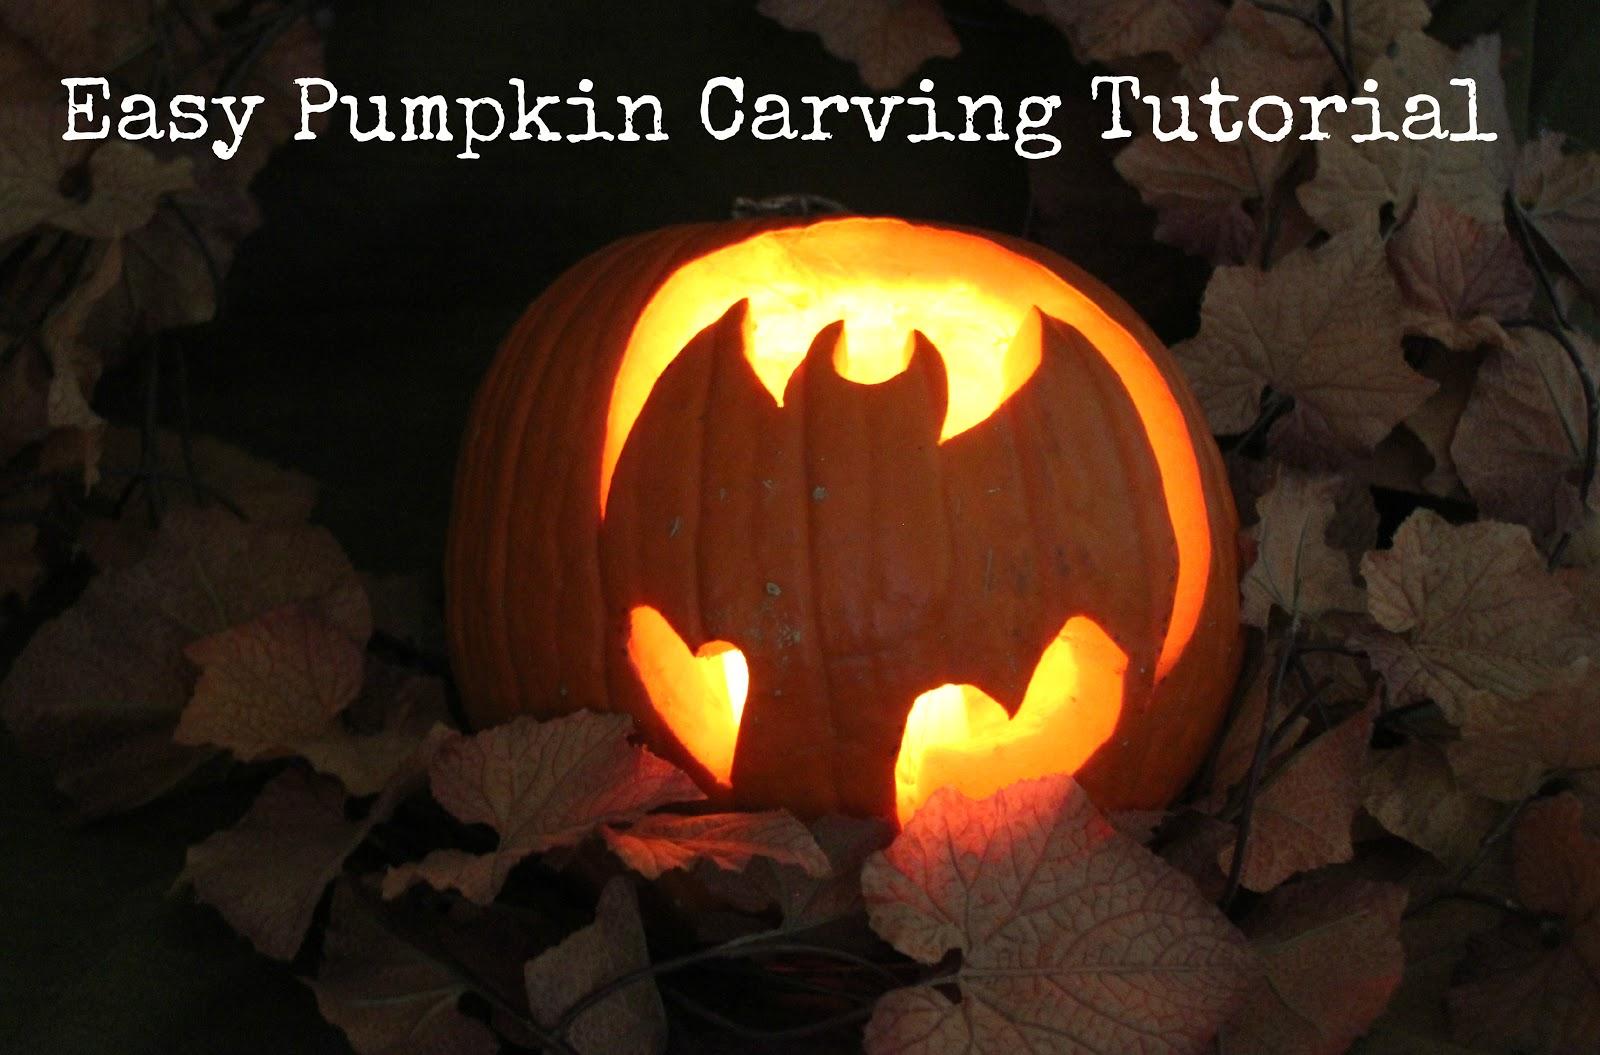 how to carve a pumpkin easy lille punkin 39. Black Bedroom Furniture Sets. Home Design Ideas